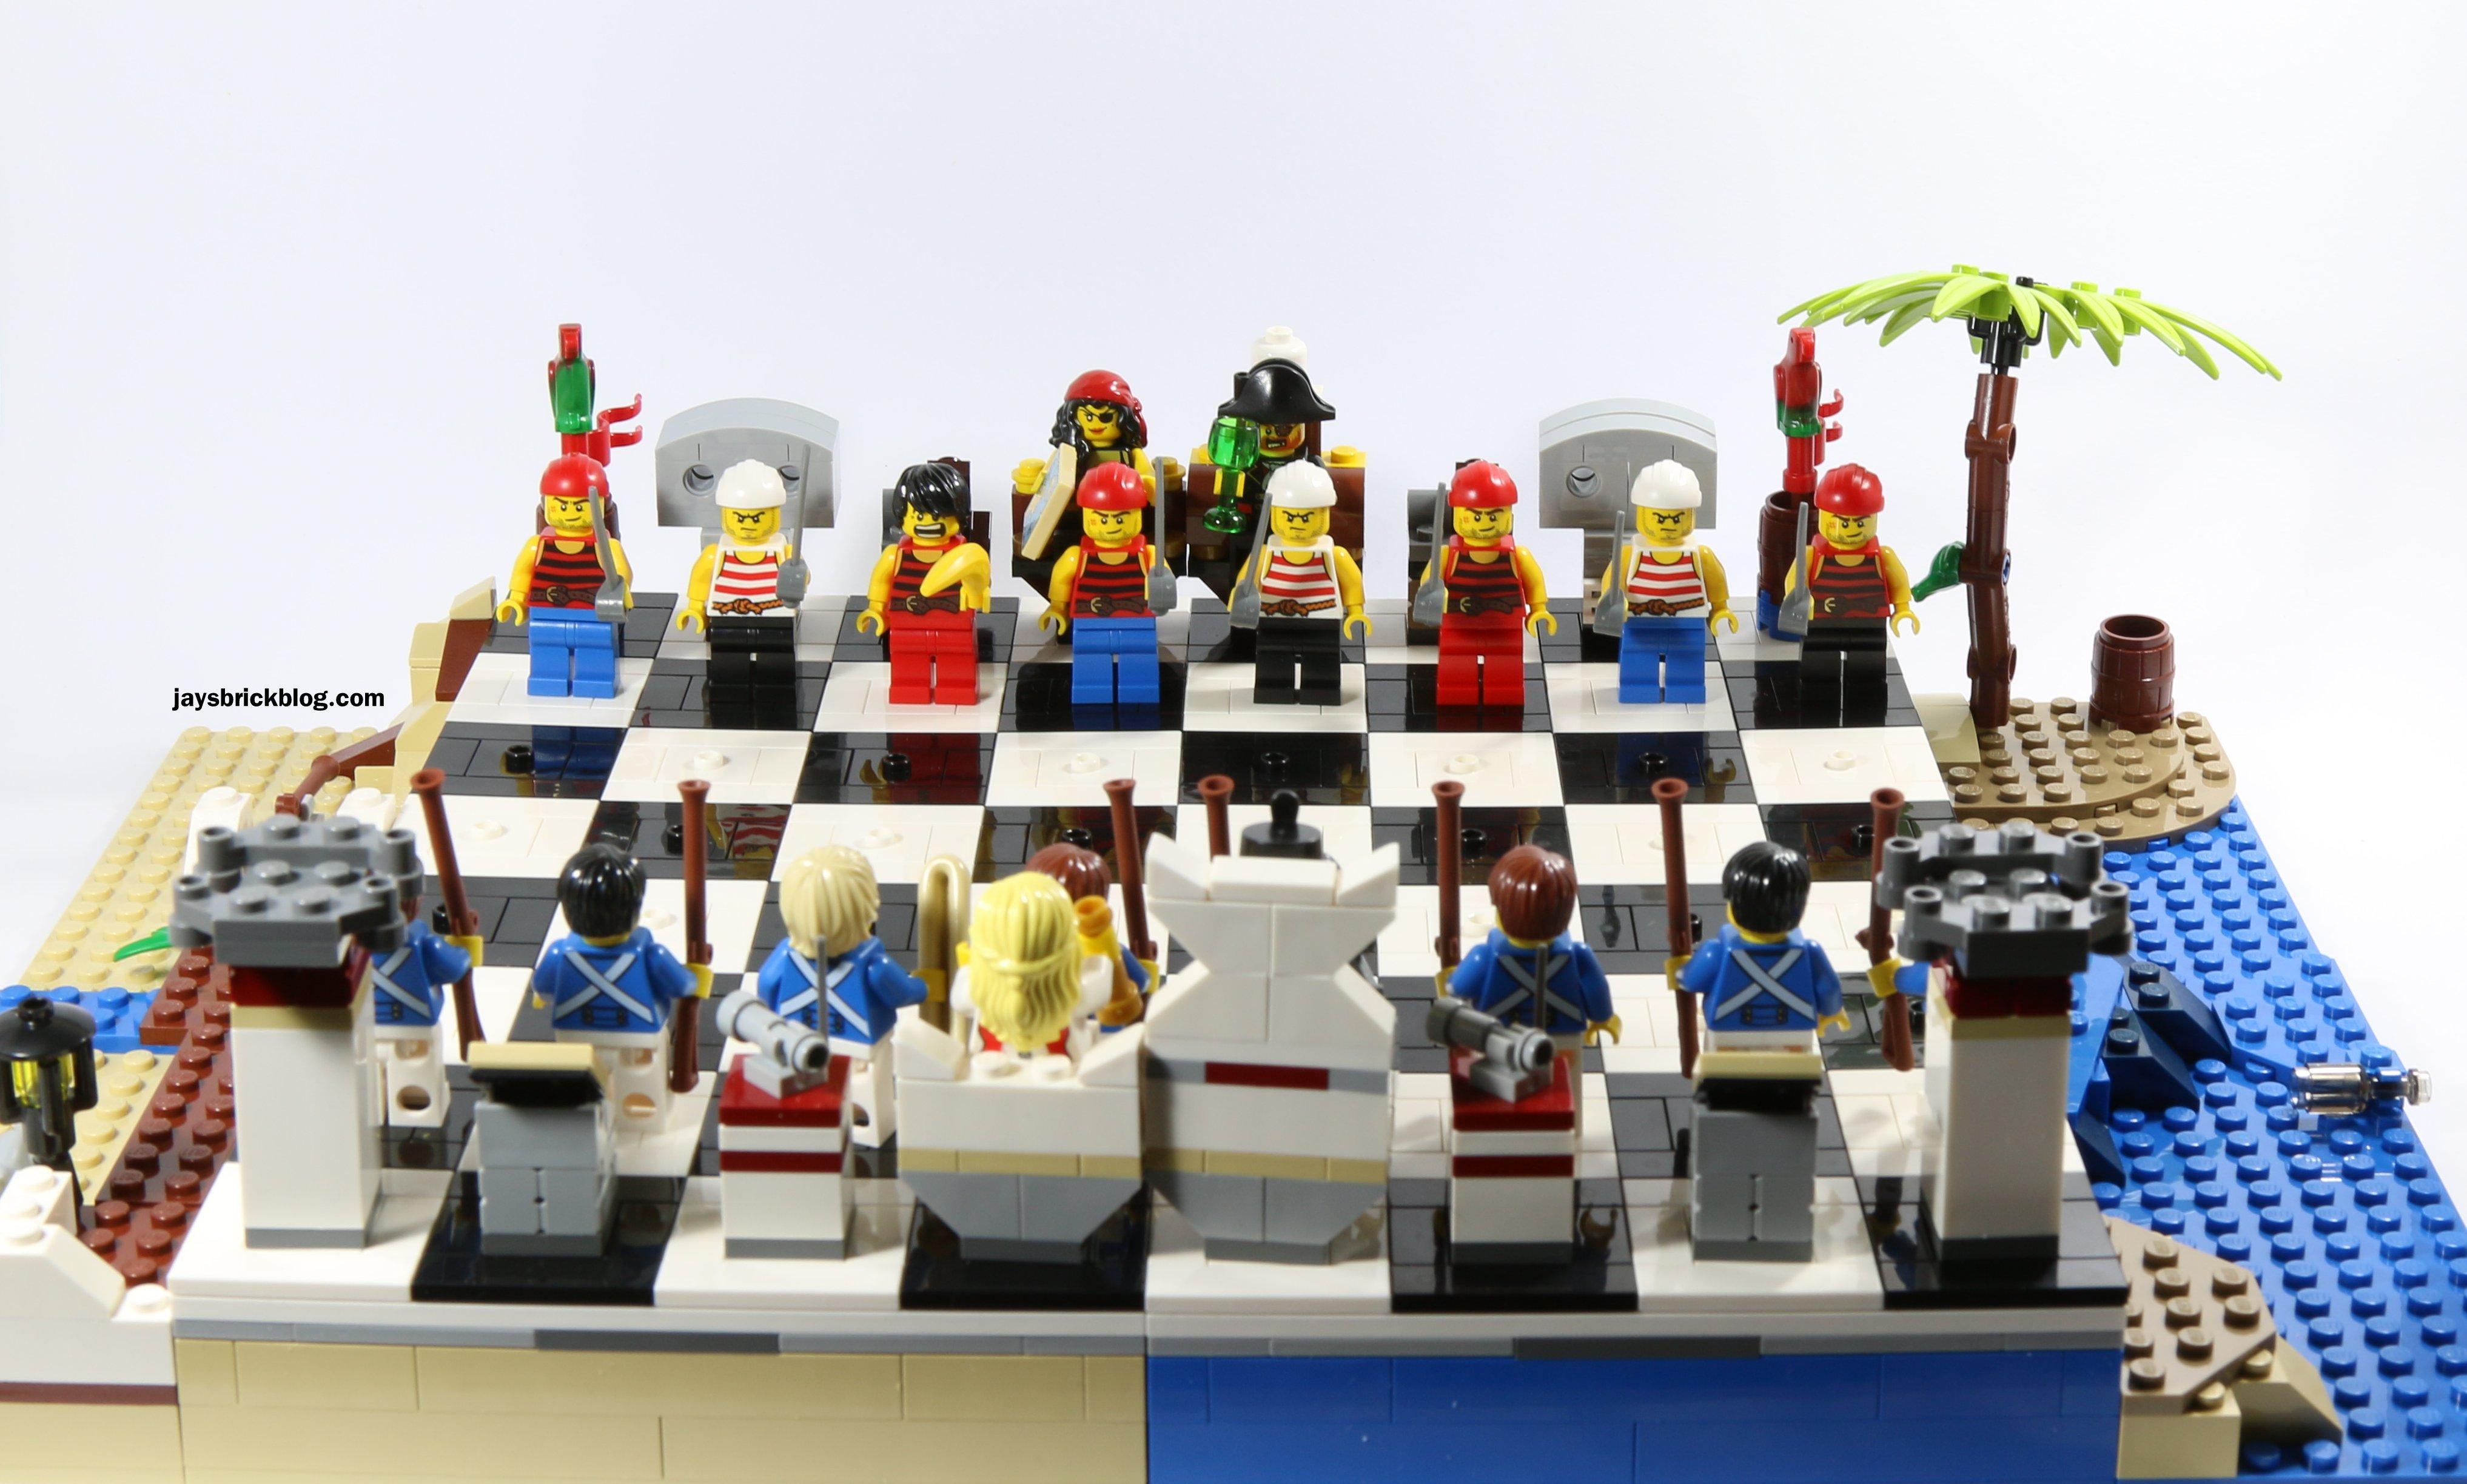 набор лего шахматы пираты желаем